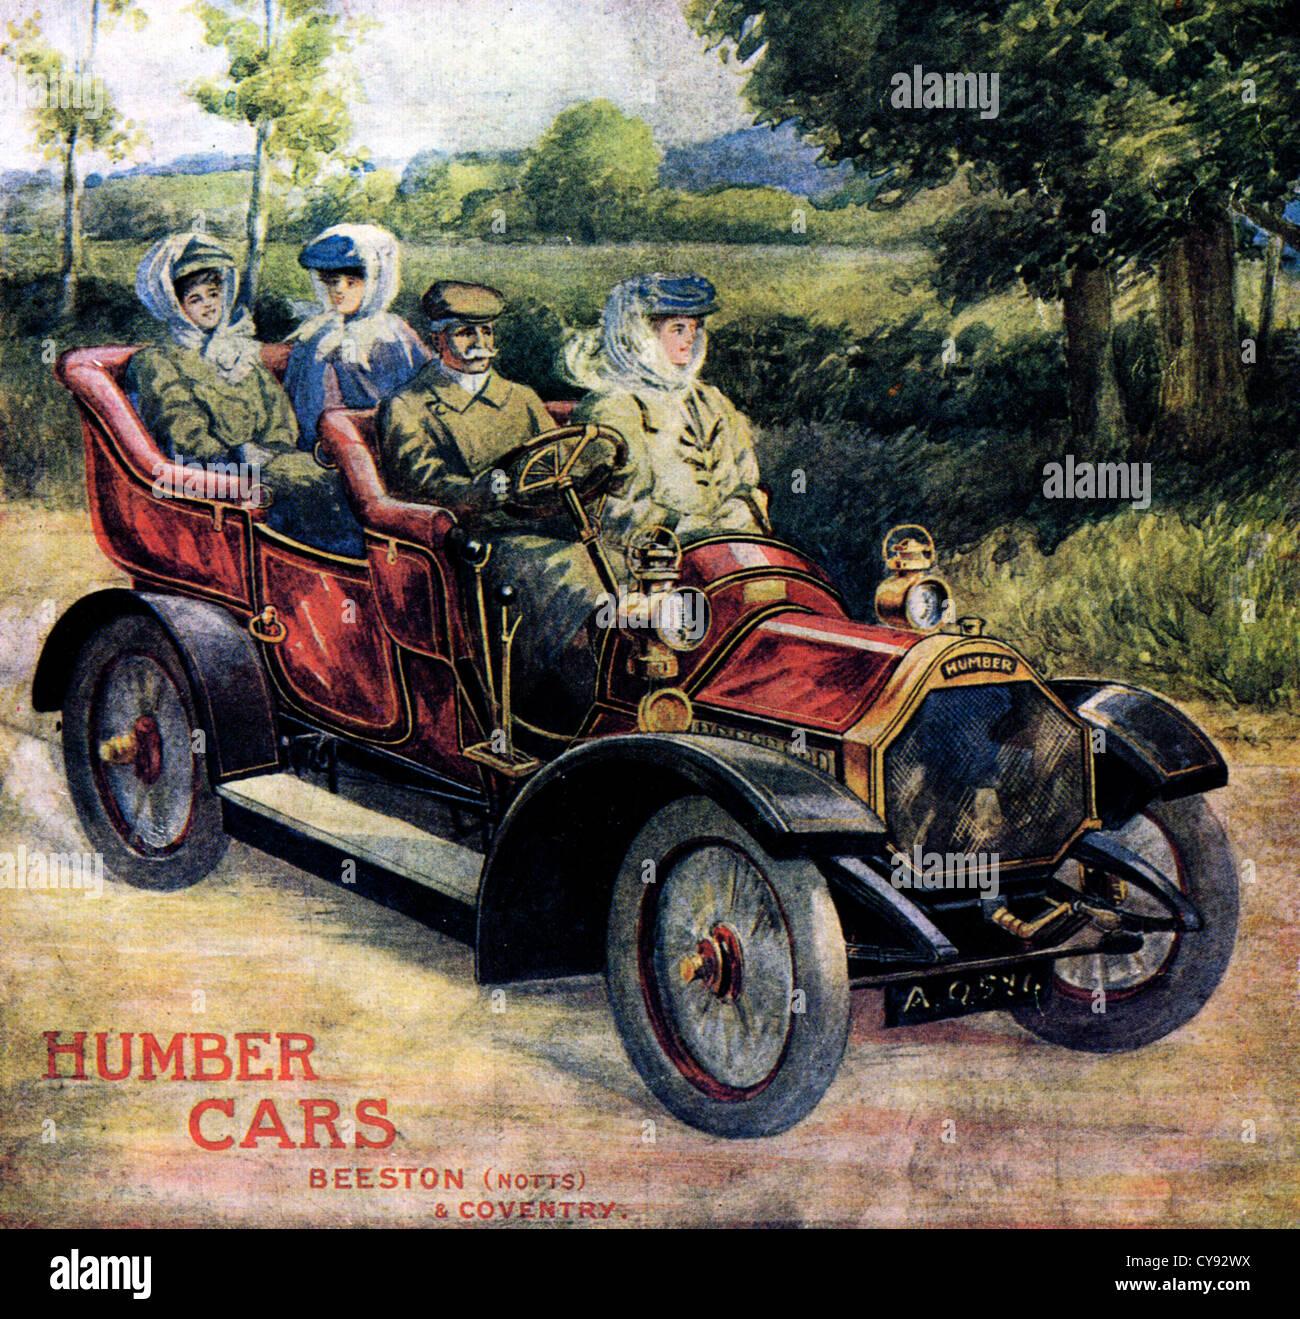 Car Stock Photos: Humber Humber Car Stock Photos & Humber Humber Car Stock